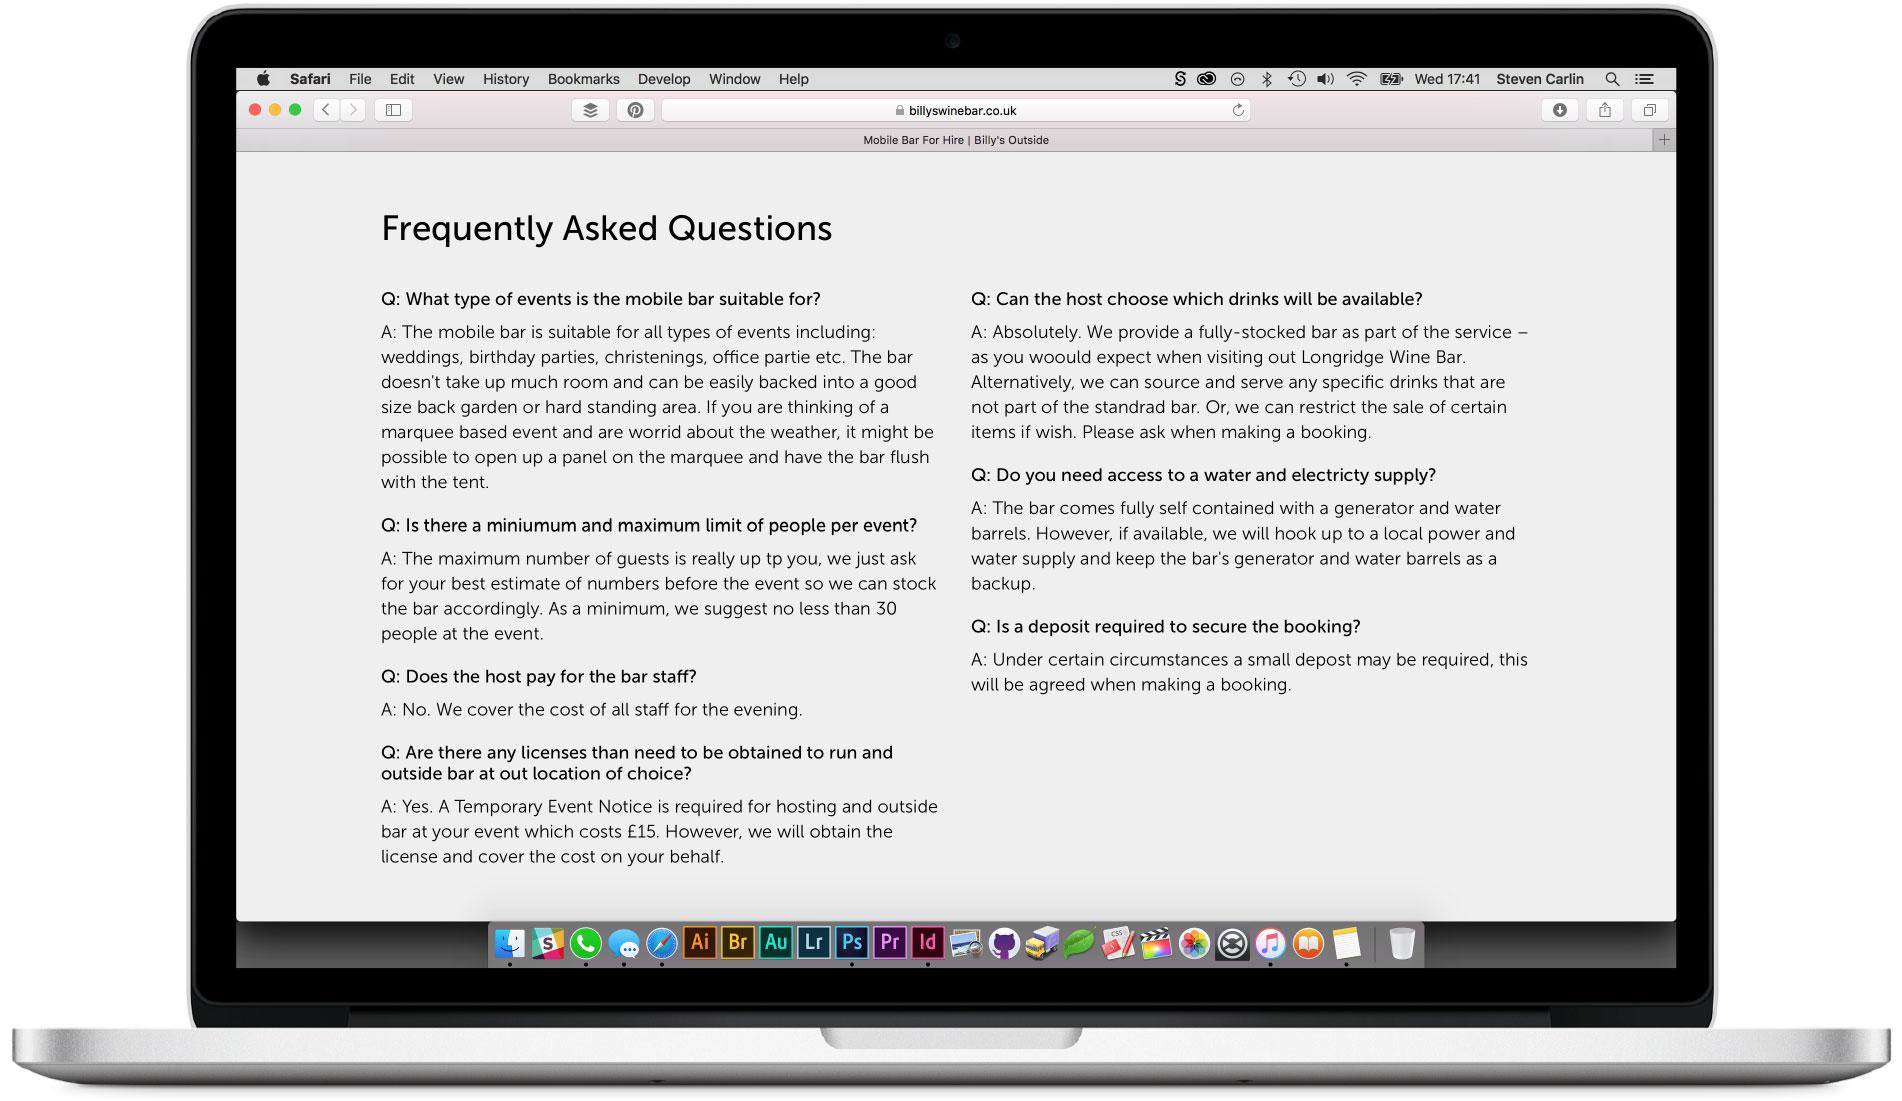 FAQ section.